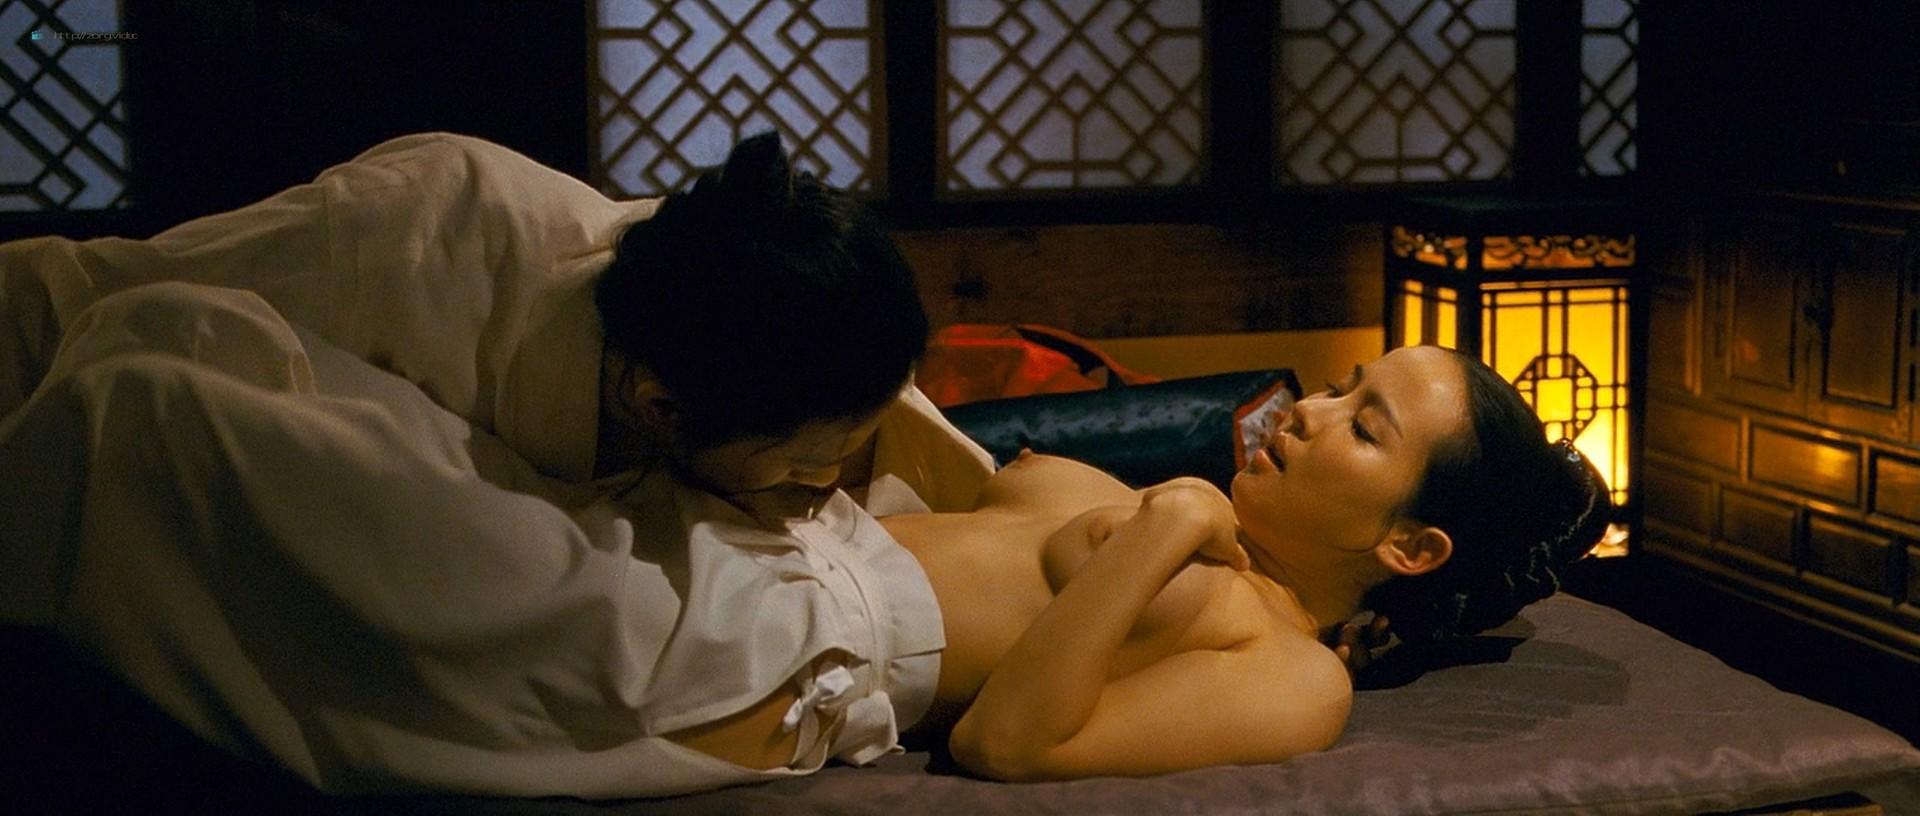 Cho Yeo-jeong nude sex Ryu Hyun-kyung nude too- The Servant (KR-2010) HD 1080p BluRay (13)